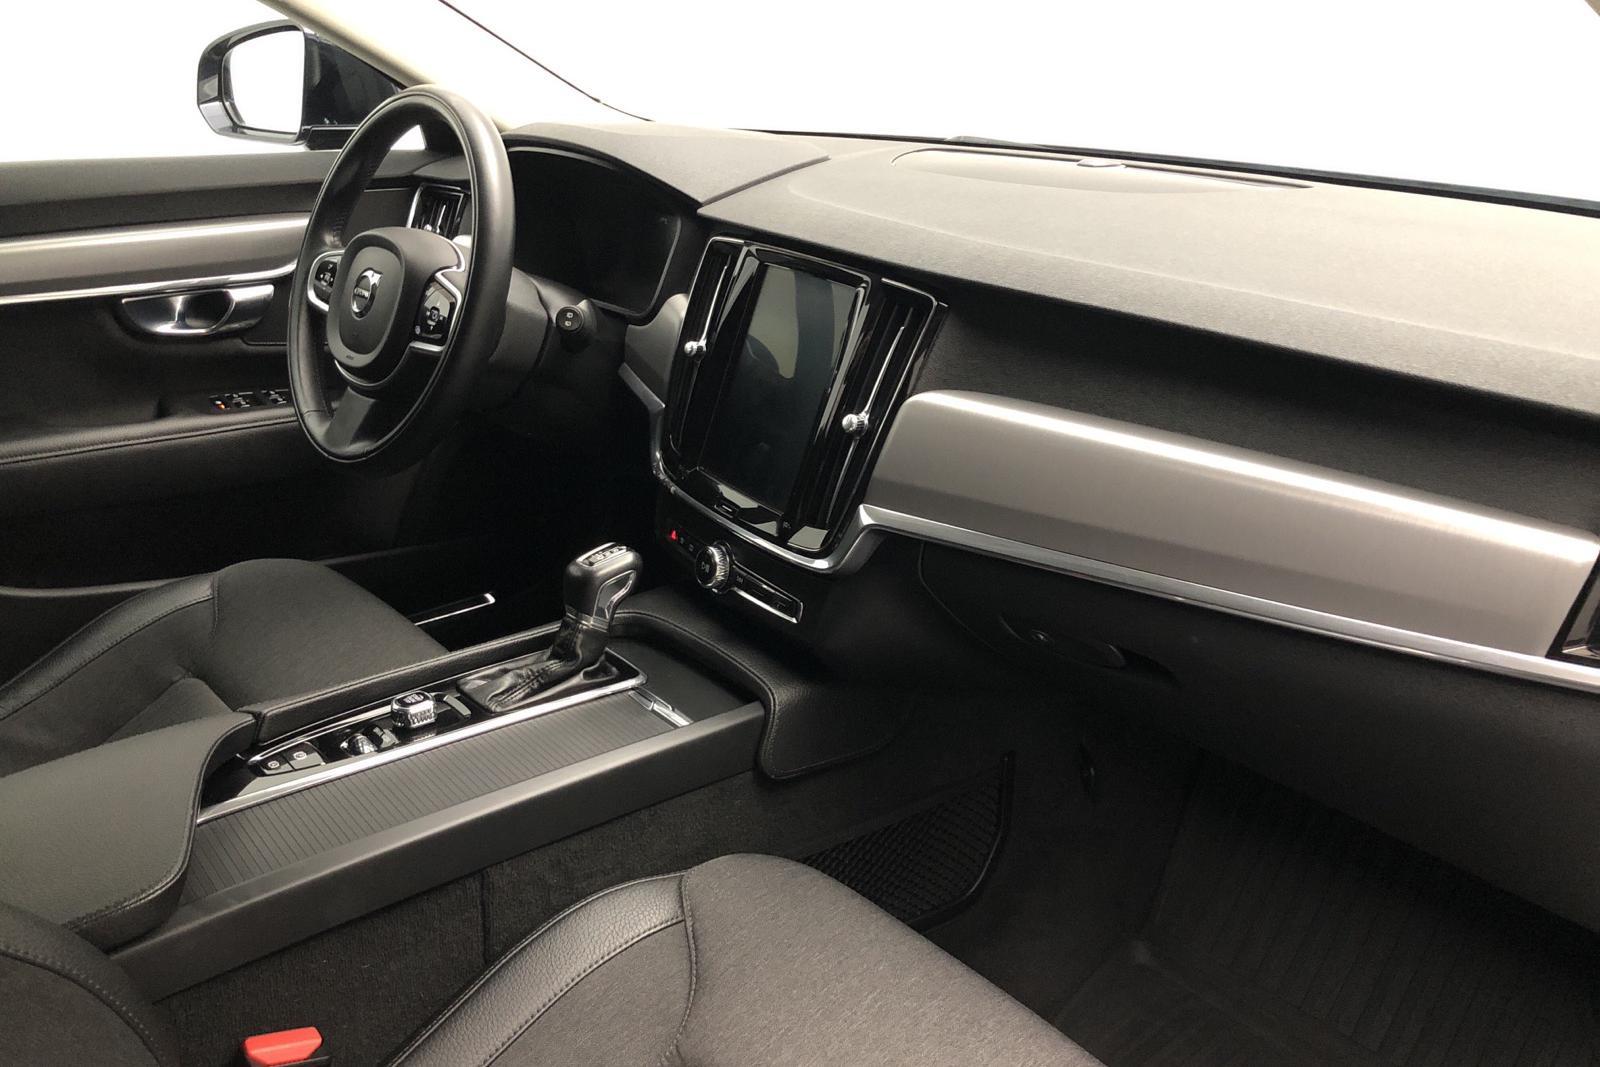 Volvo V90 D4 (190hk) - 71 960 km - Automatic - Dark Blue - 2019